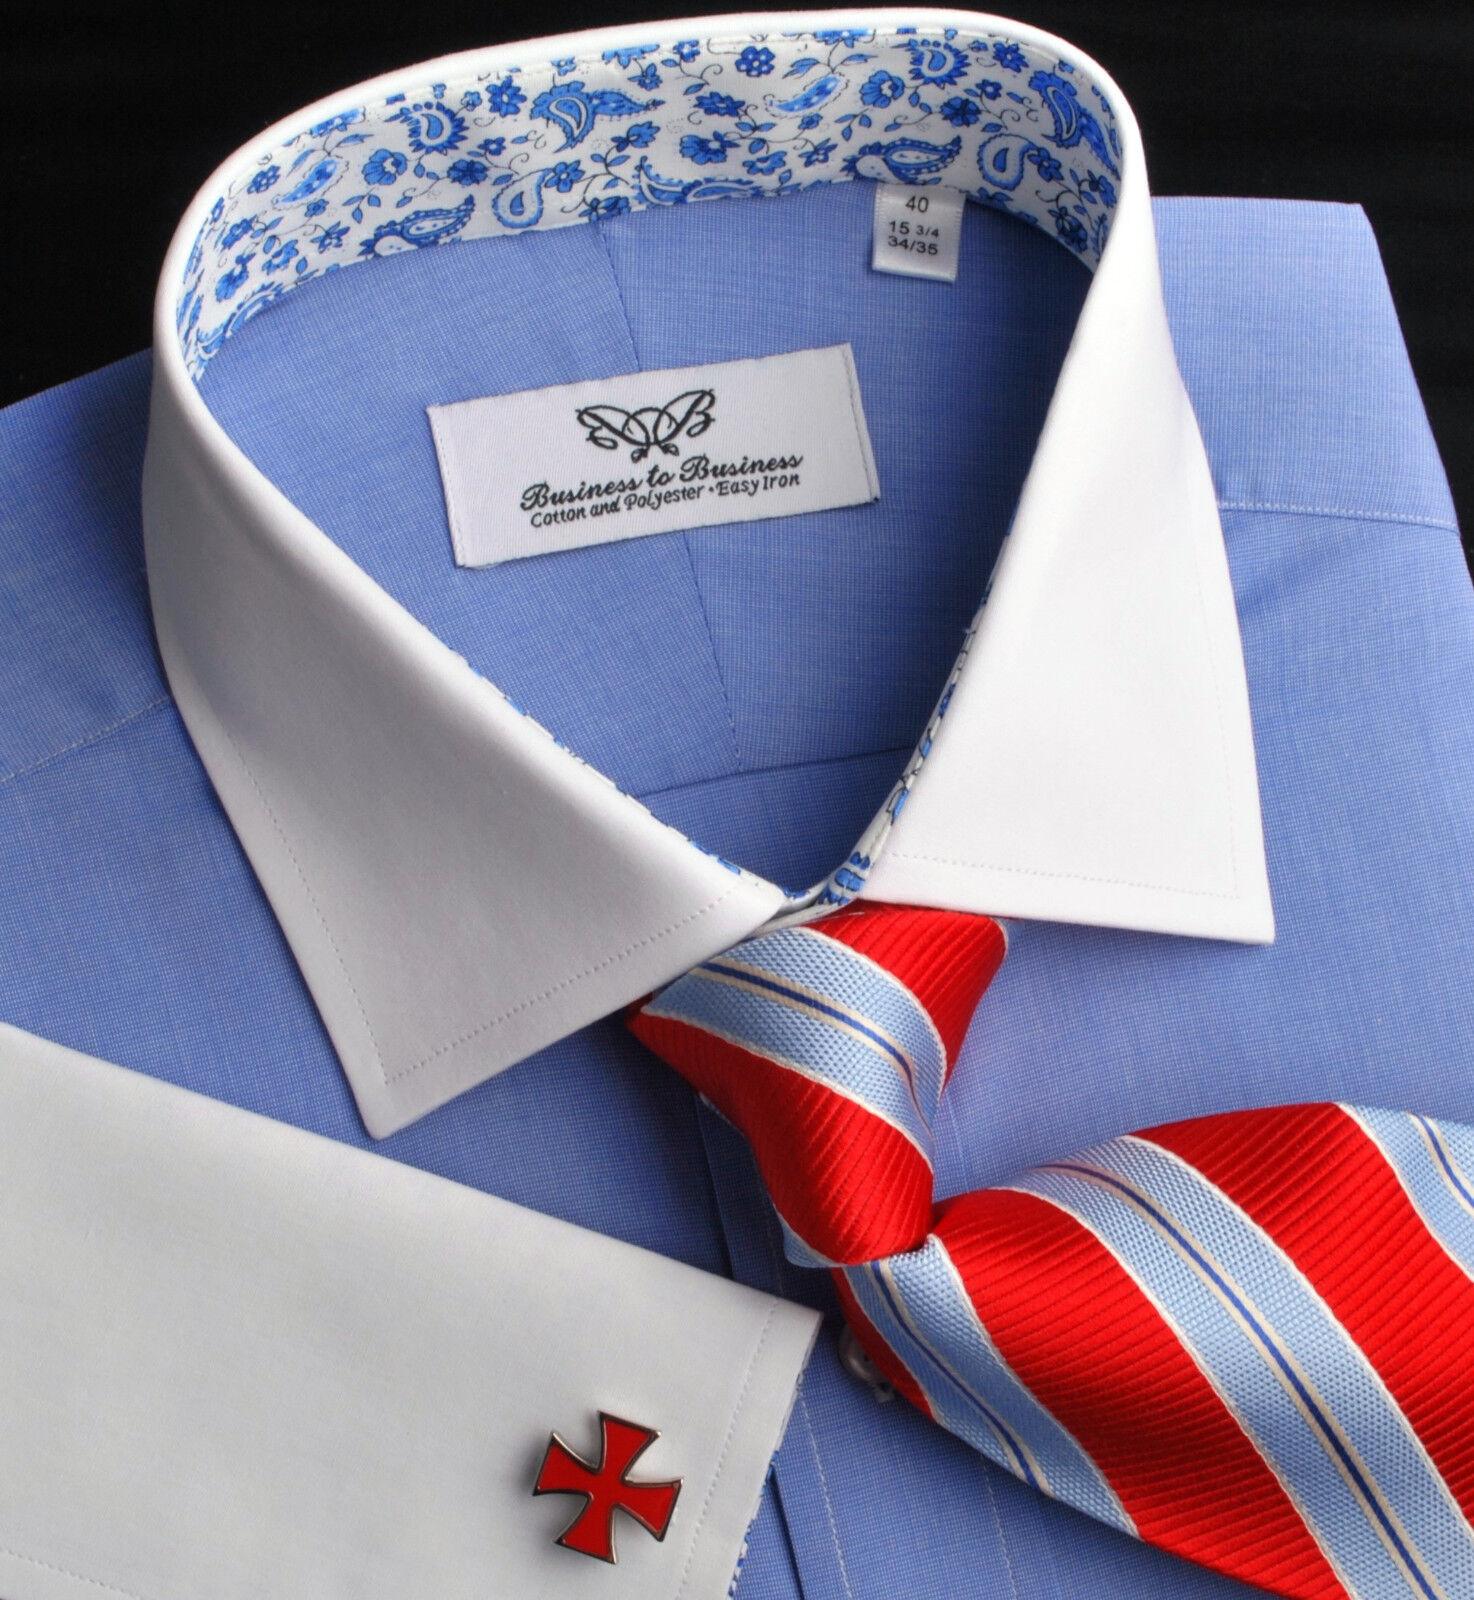 Blau Wrinkle Free Poplin Formal Geschäft Dress Shirt Weiß Contrast Cuff Collar